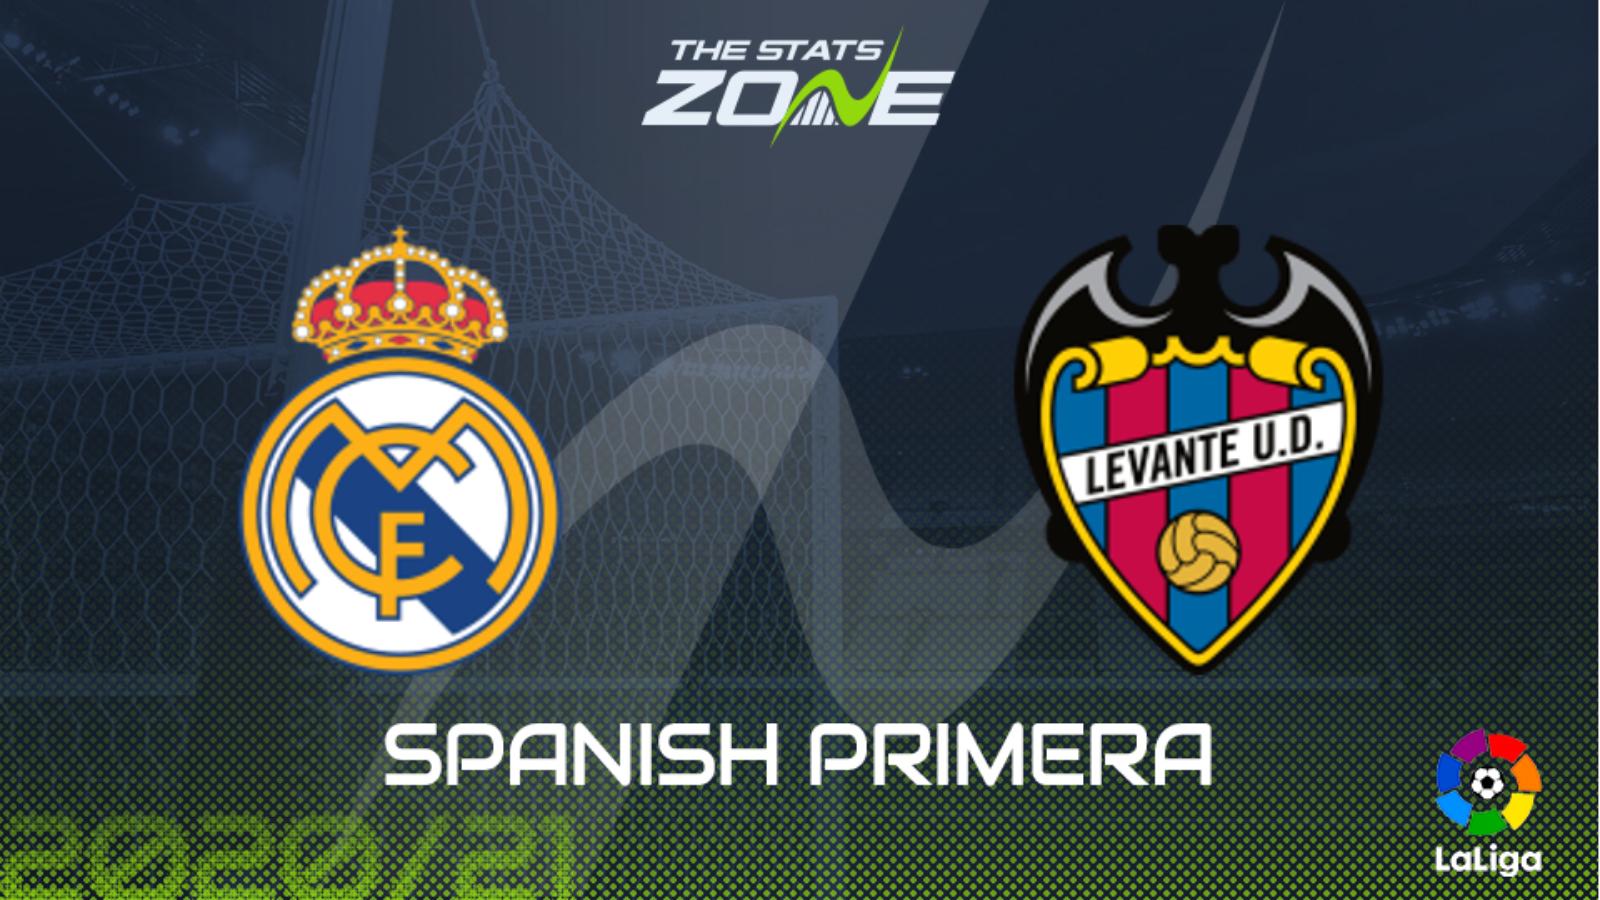 Espanyol vs levante betting expert basketball arbitrage sports betting sites